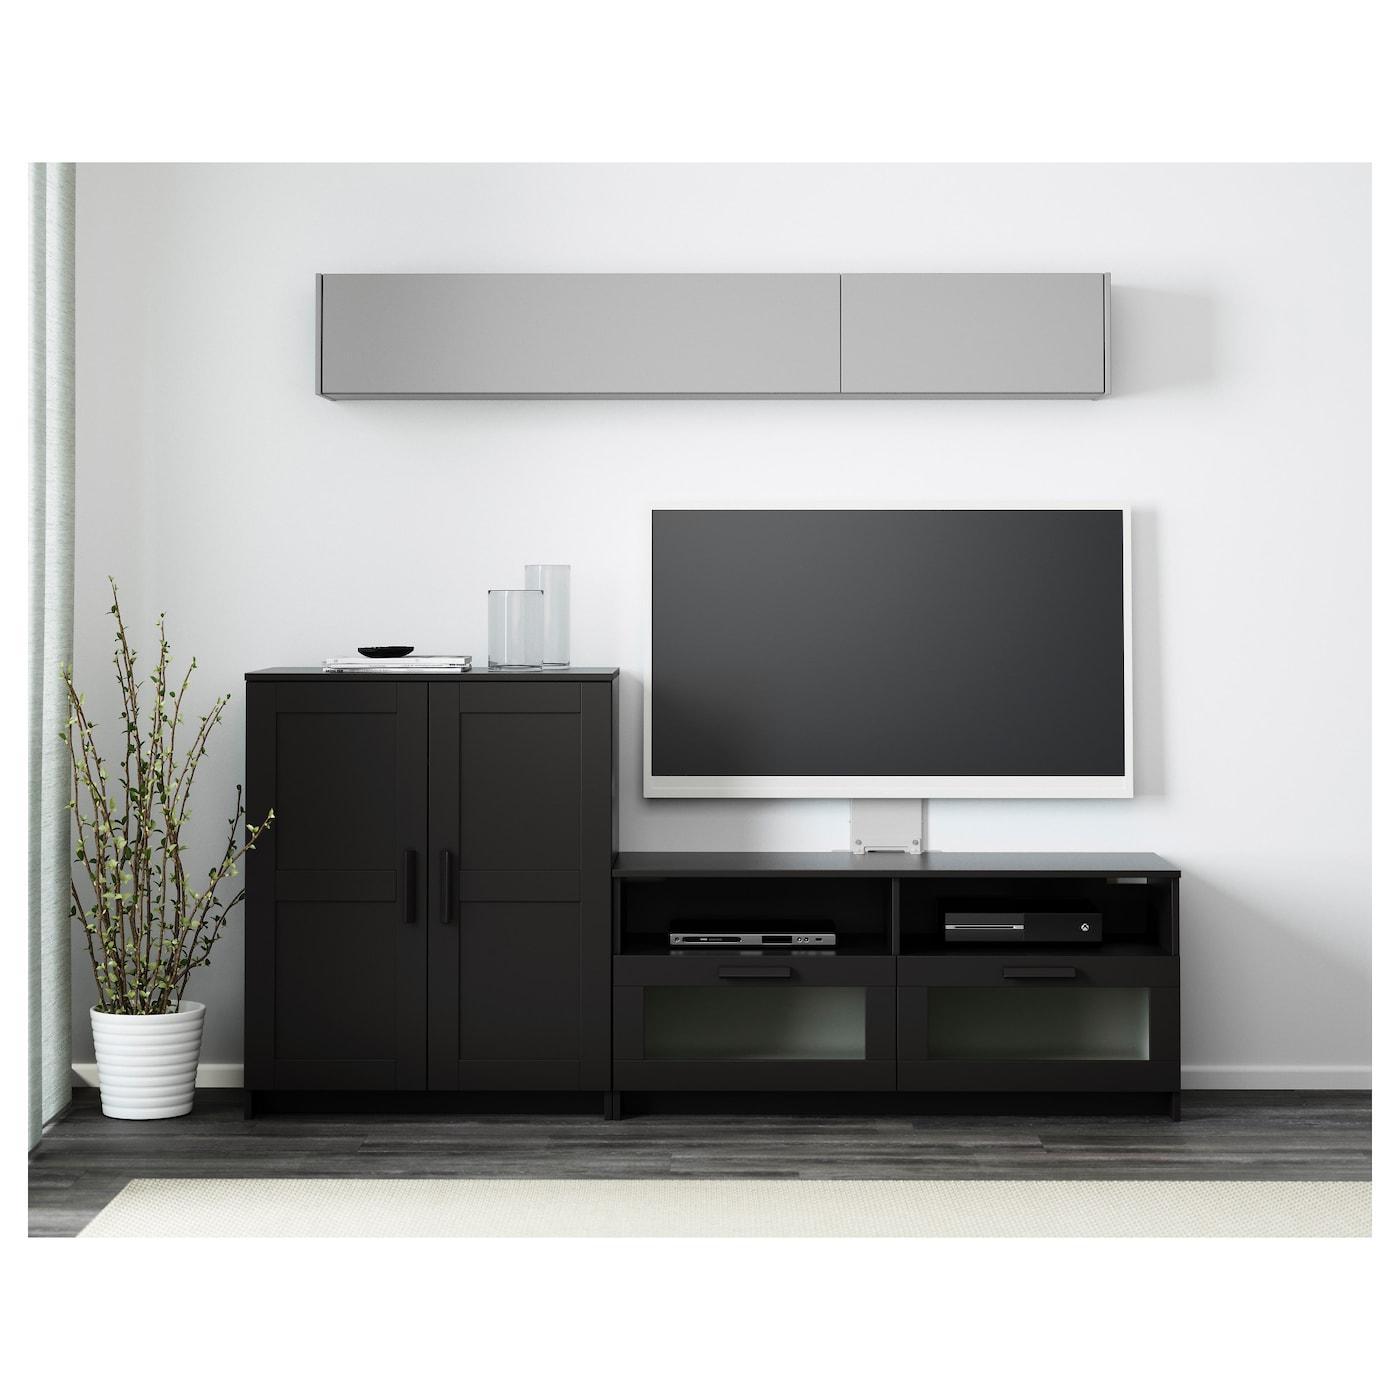 Tv Chair Ikea 28 Images Best 197 Ikea Ikea Besta Furniture  # Meuble Tv Ikea Besta Burs Noir